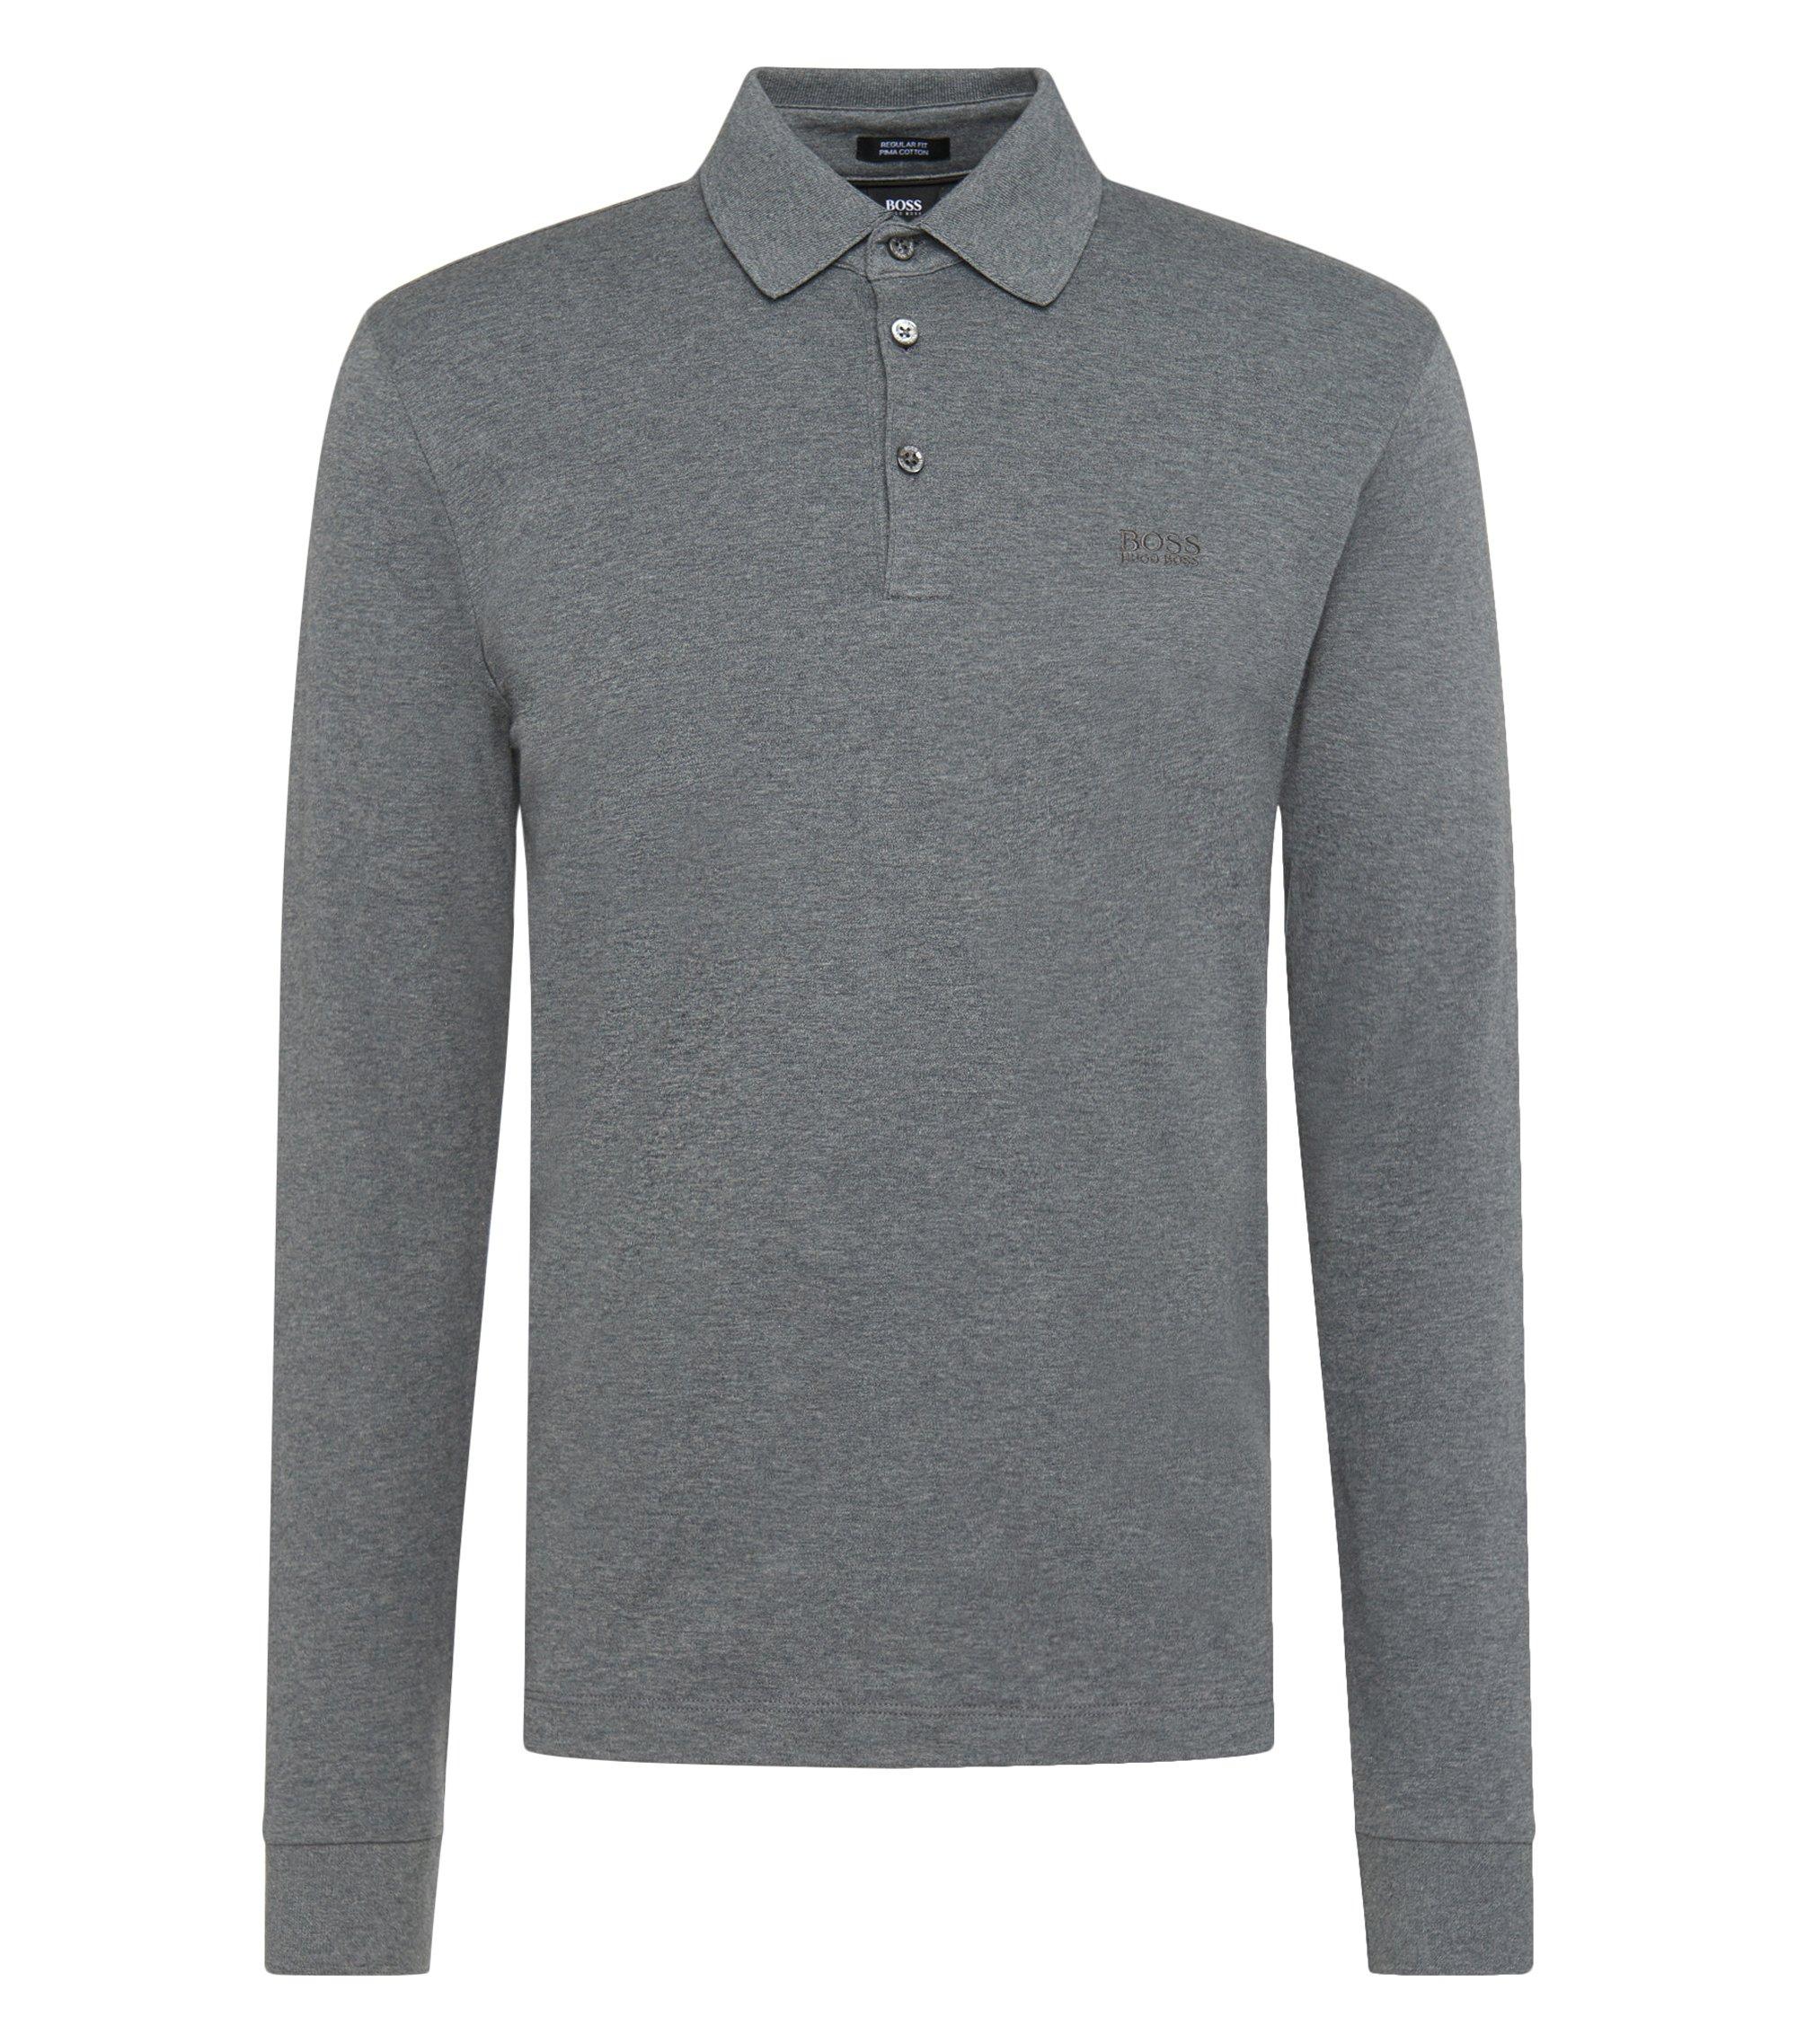 Regular-Fit Longsleeve Poloshirt aus Interlock-Baumwolle, Grau